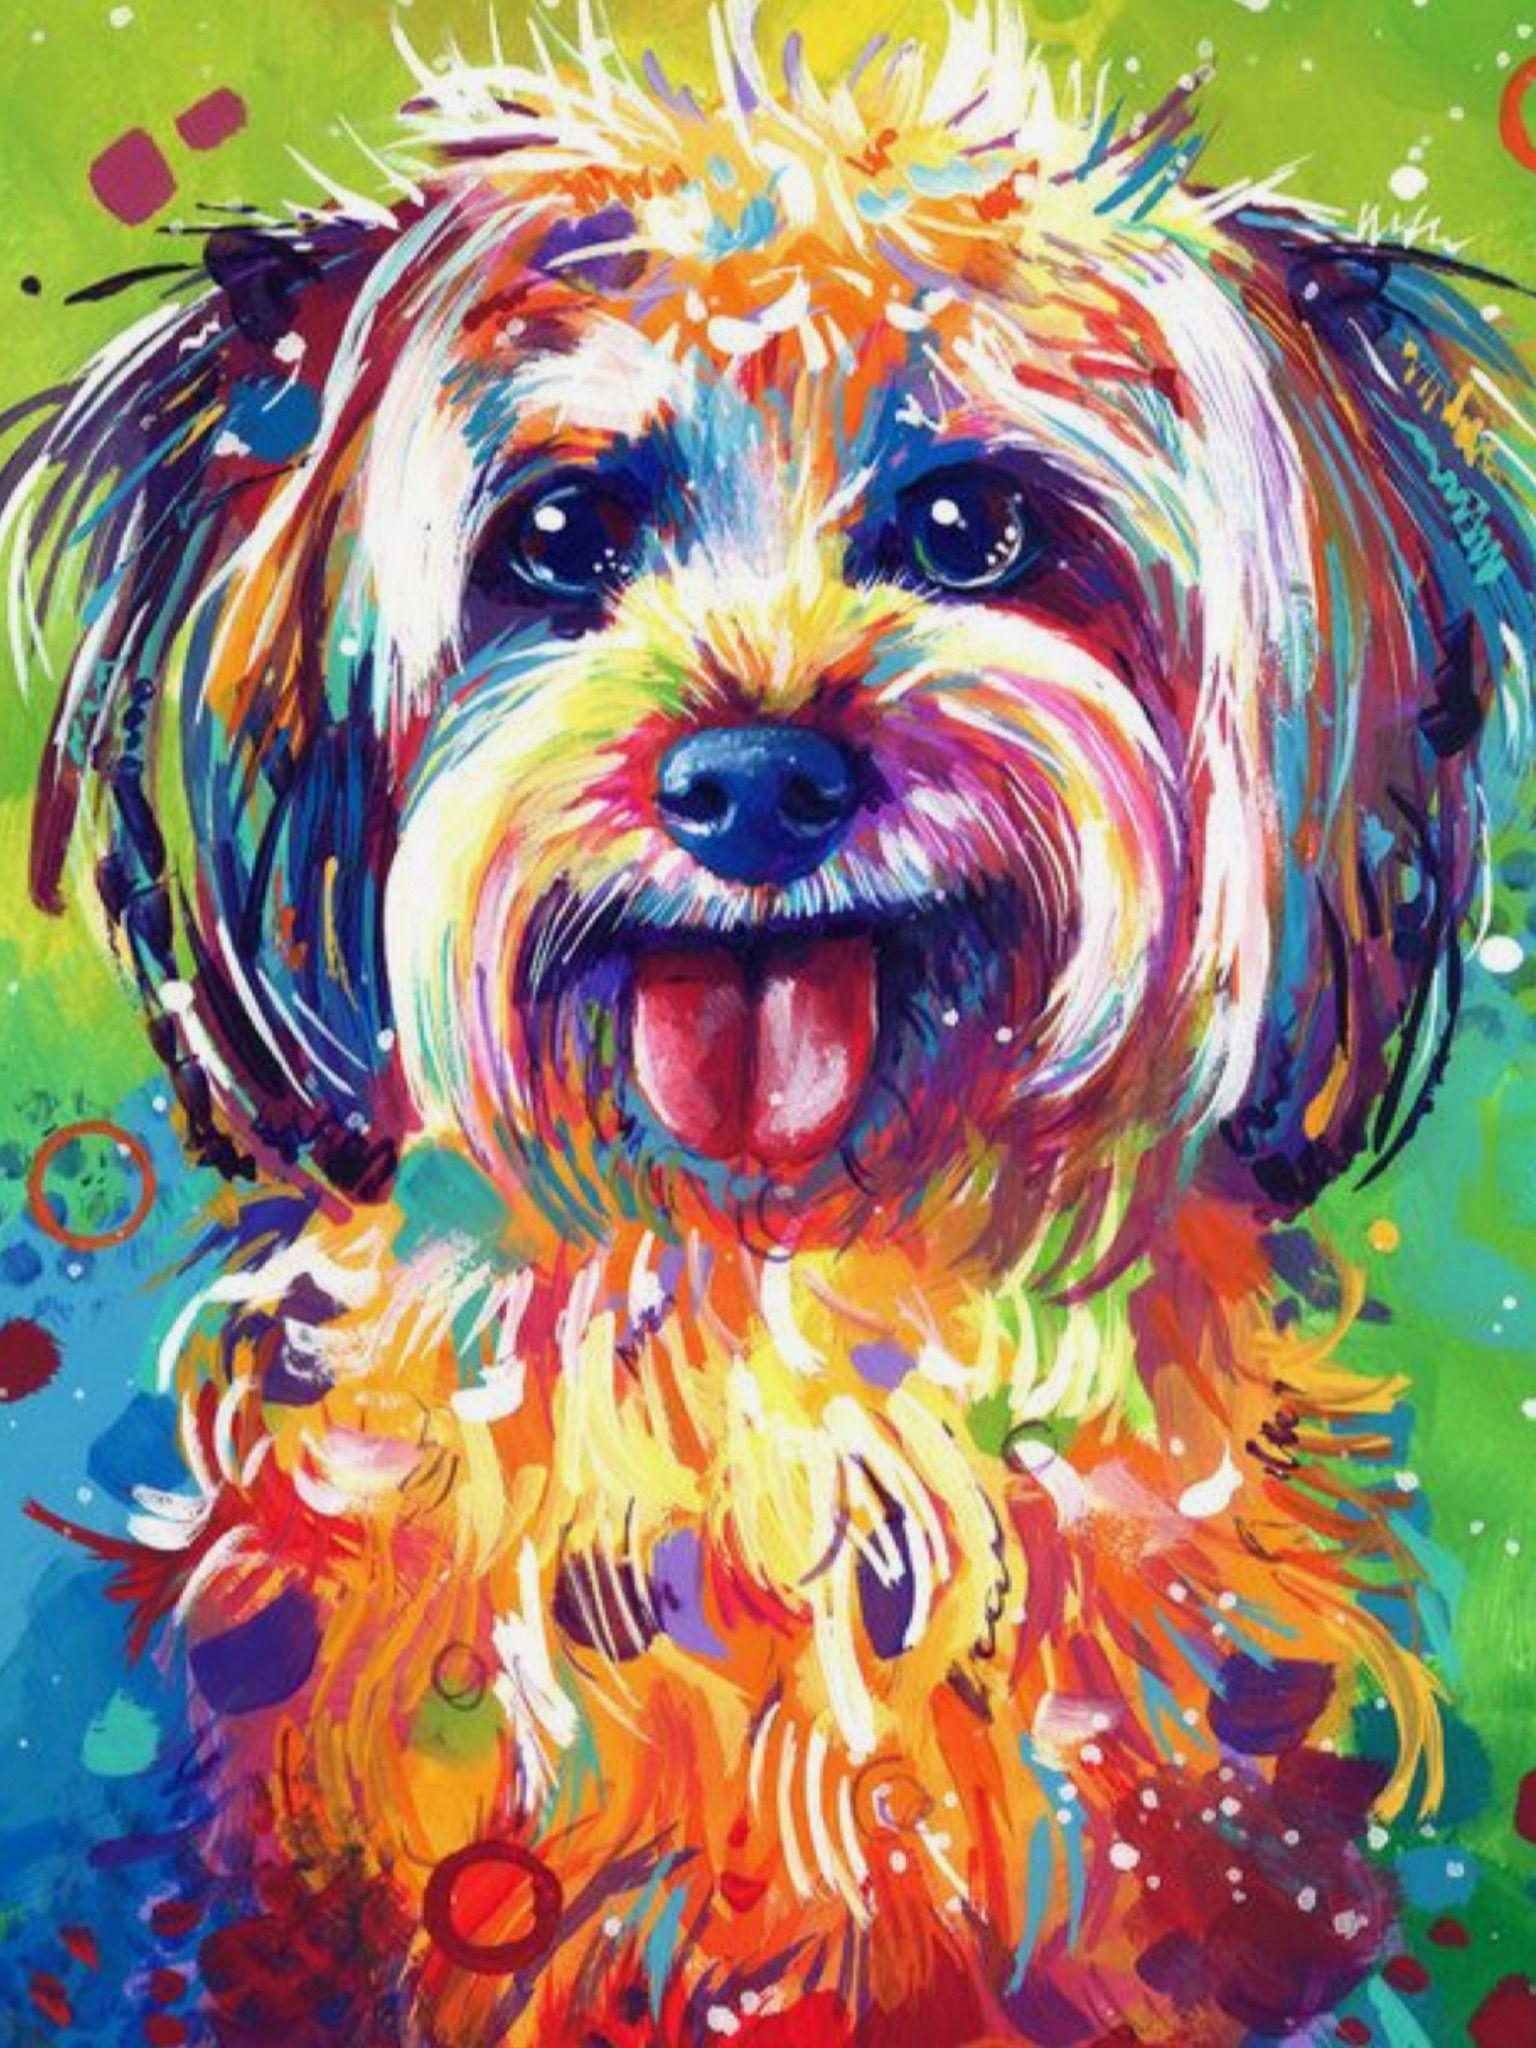 Pin By Simona Alana On Art Pins I Like Dog Pop Art Dog Paintings Pop Art